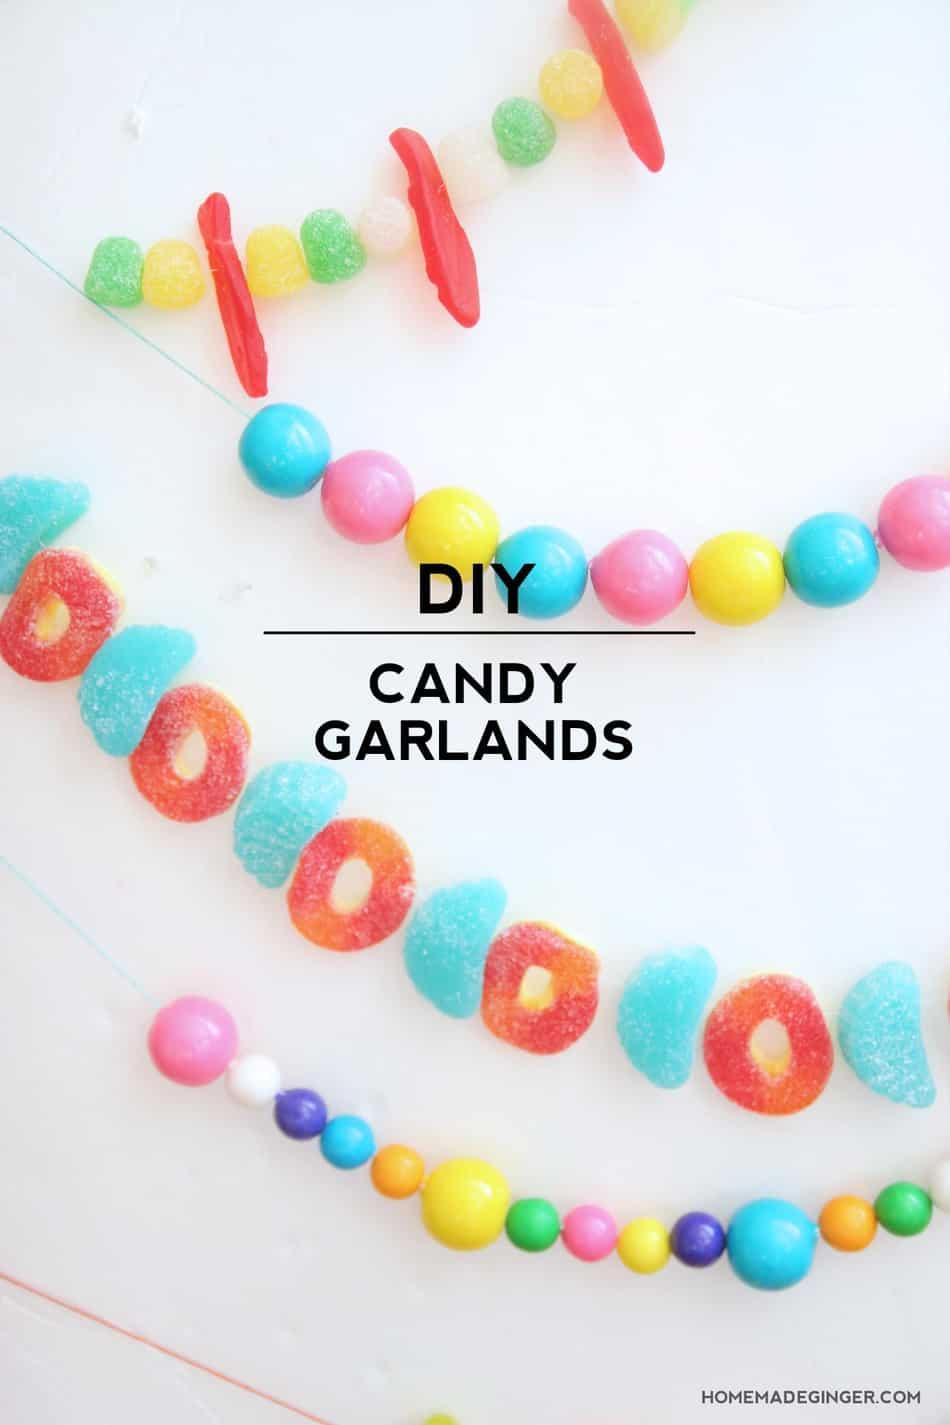 Diy Candy Garlands Homemadeginger